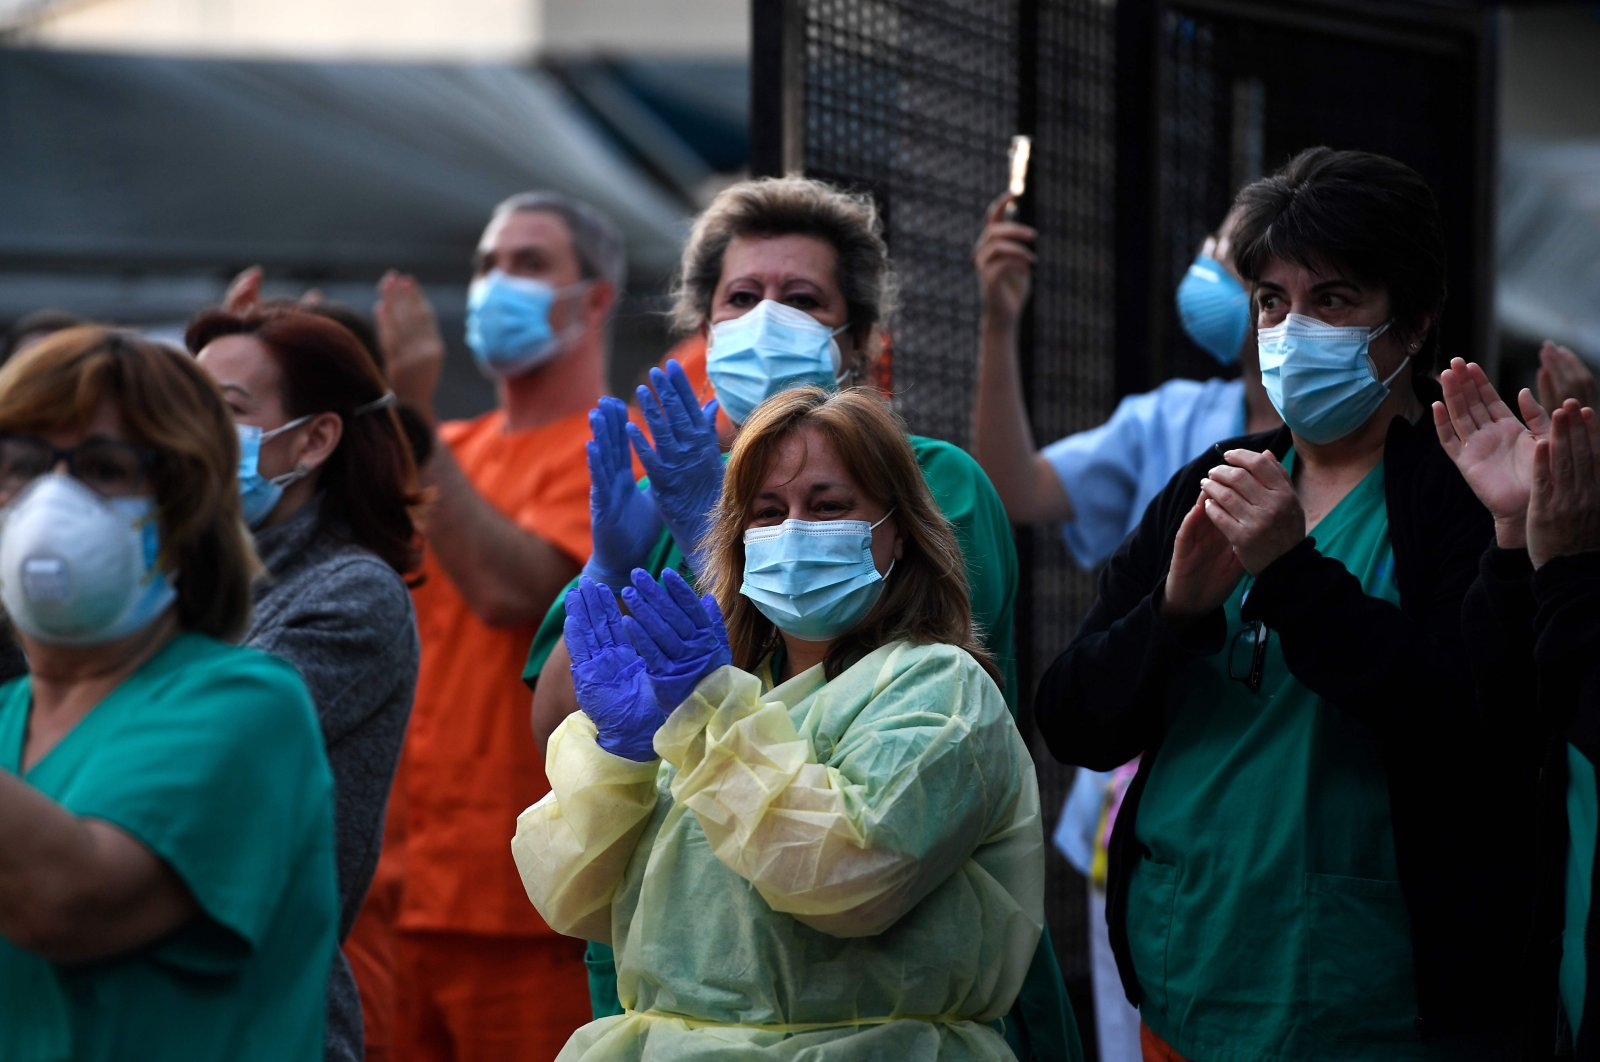 Heath care workers applaud amid grateful cheers outside Gregorio Maranon hospital, Madrid, April 12, 2020. (AFP Photo)